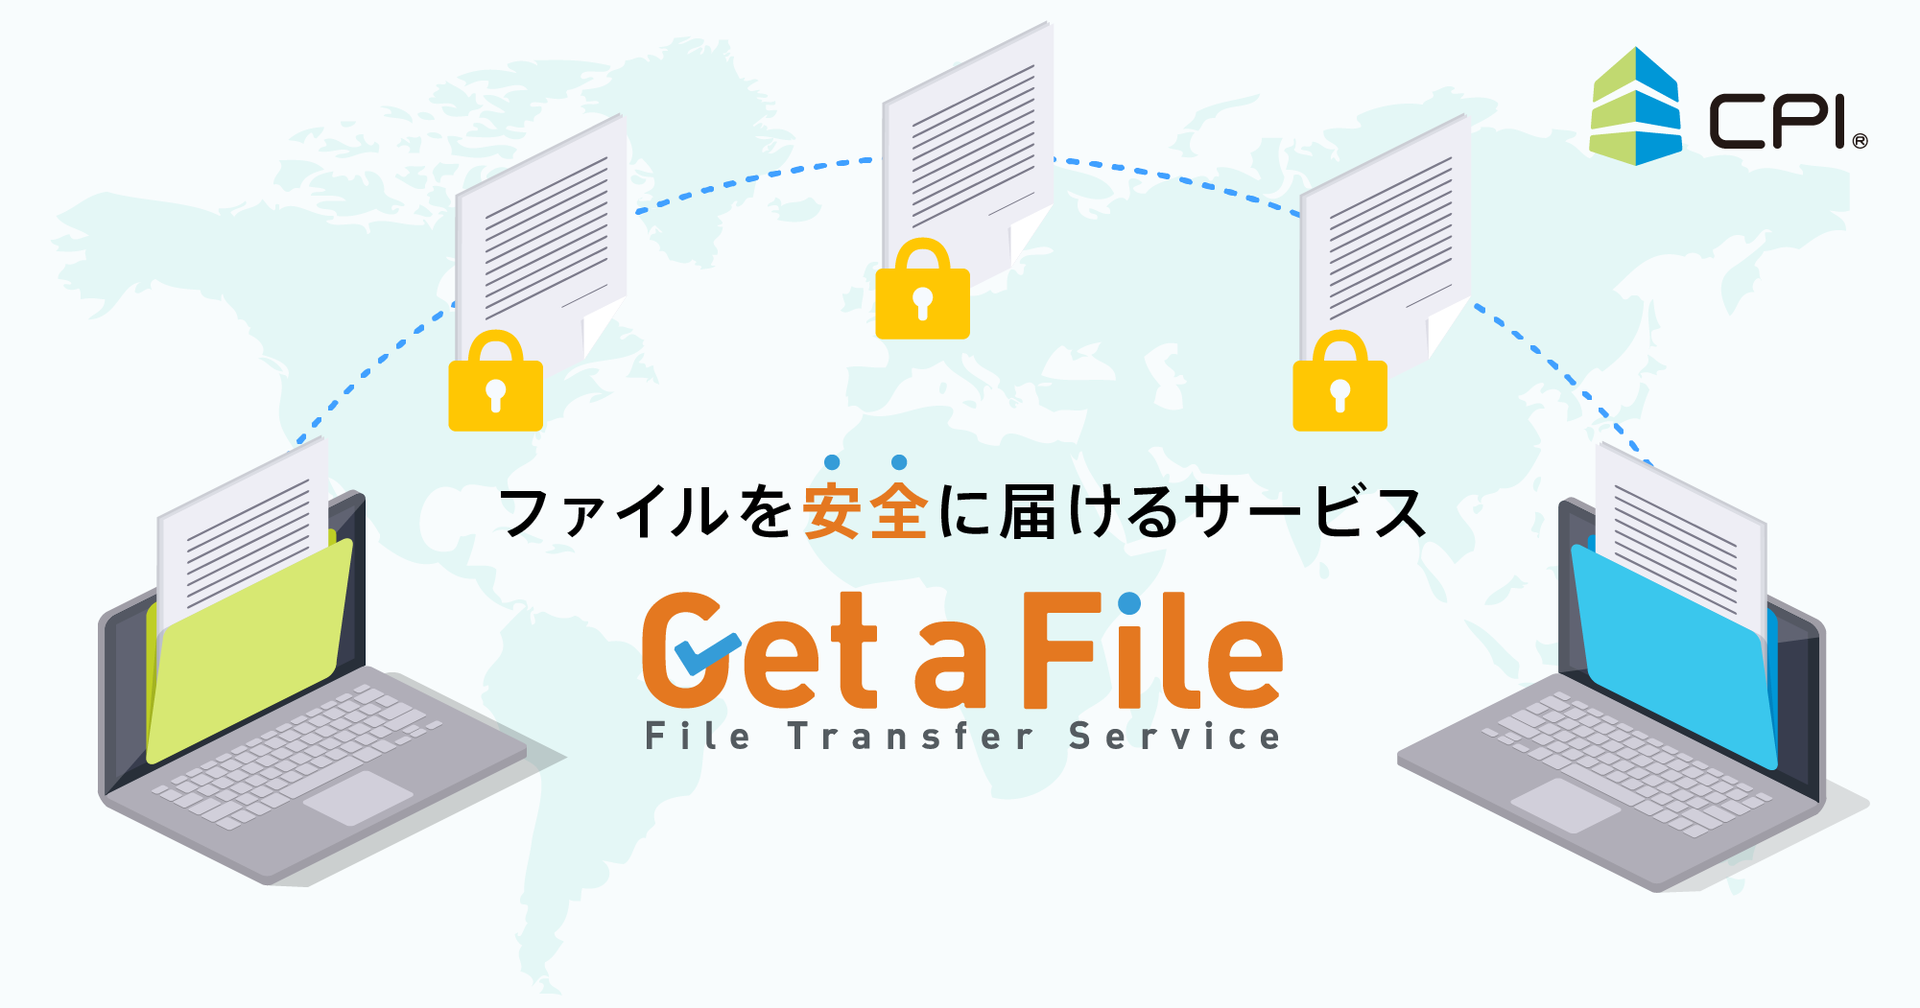 Get a File